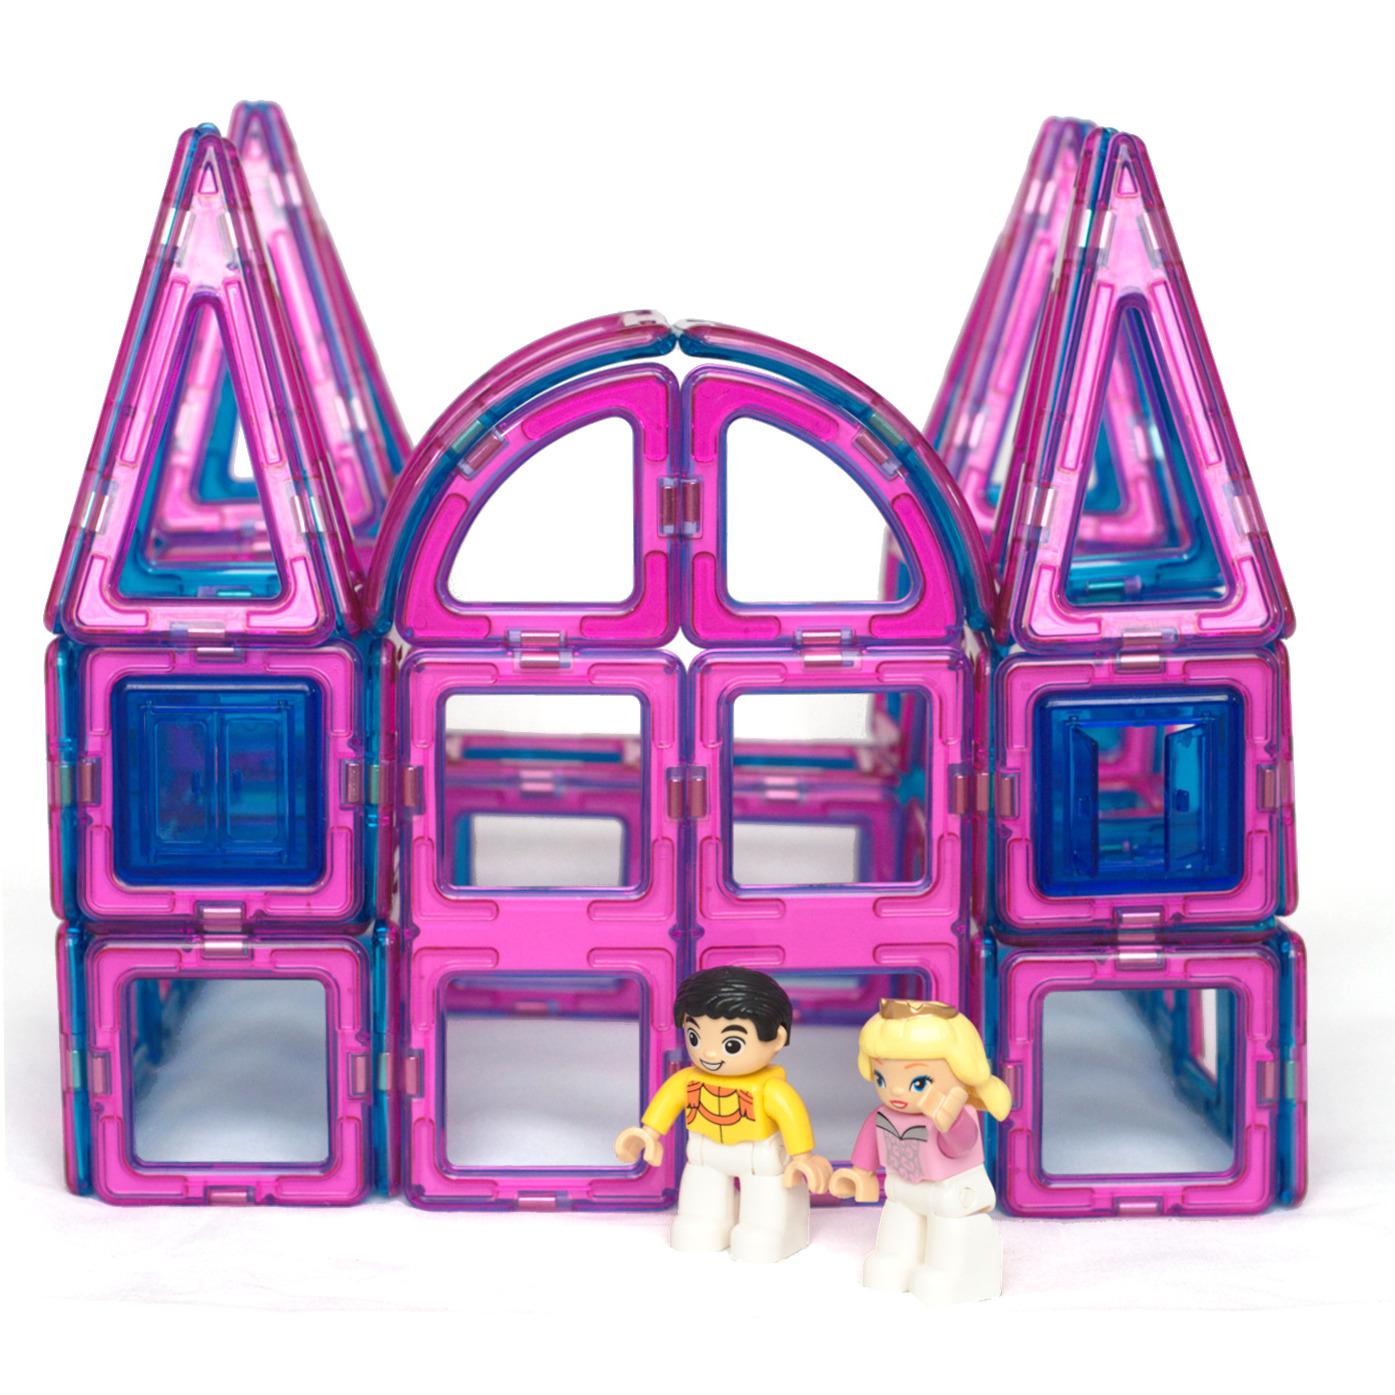 Magnetic Tile Princess Castle Set 62 Piece Kit Pink And